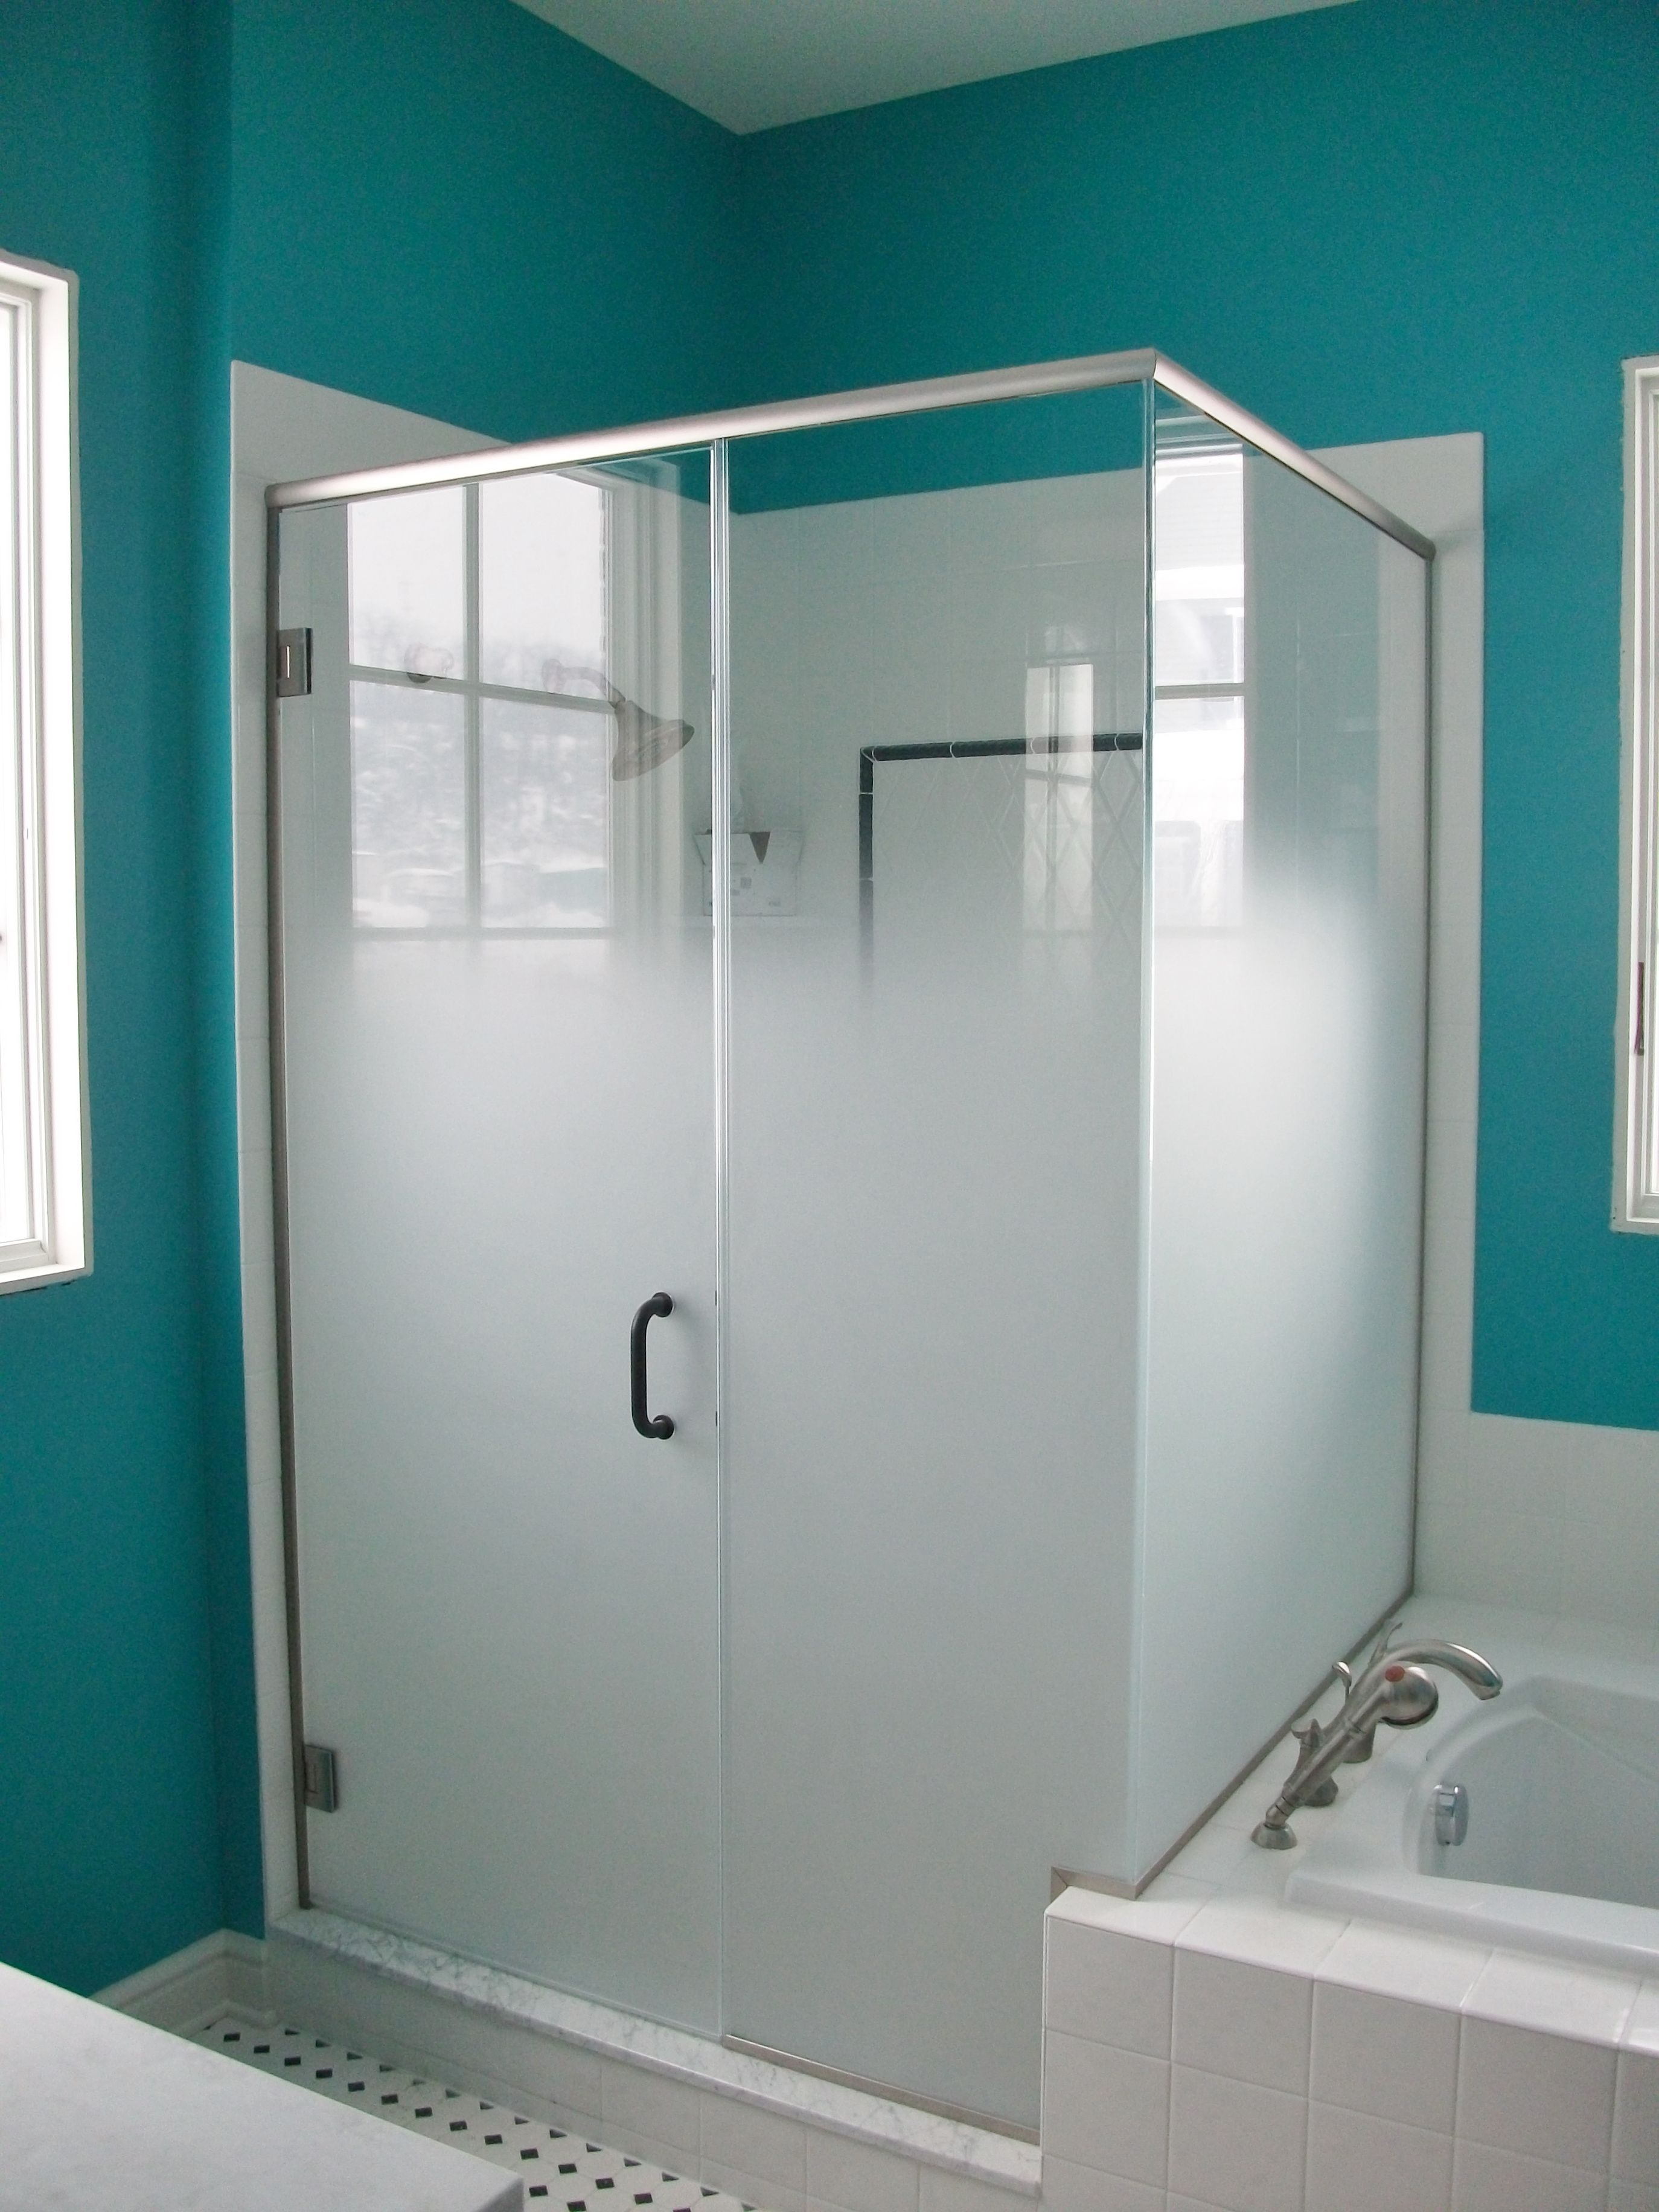 Frameless Shower Enclosure Door Panel Return Panel With